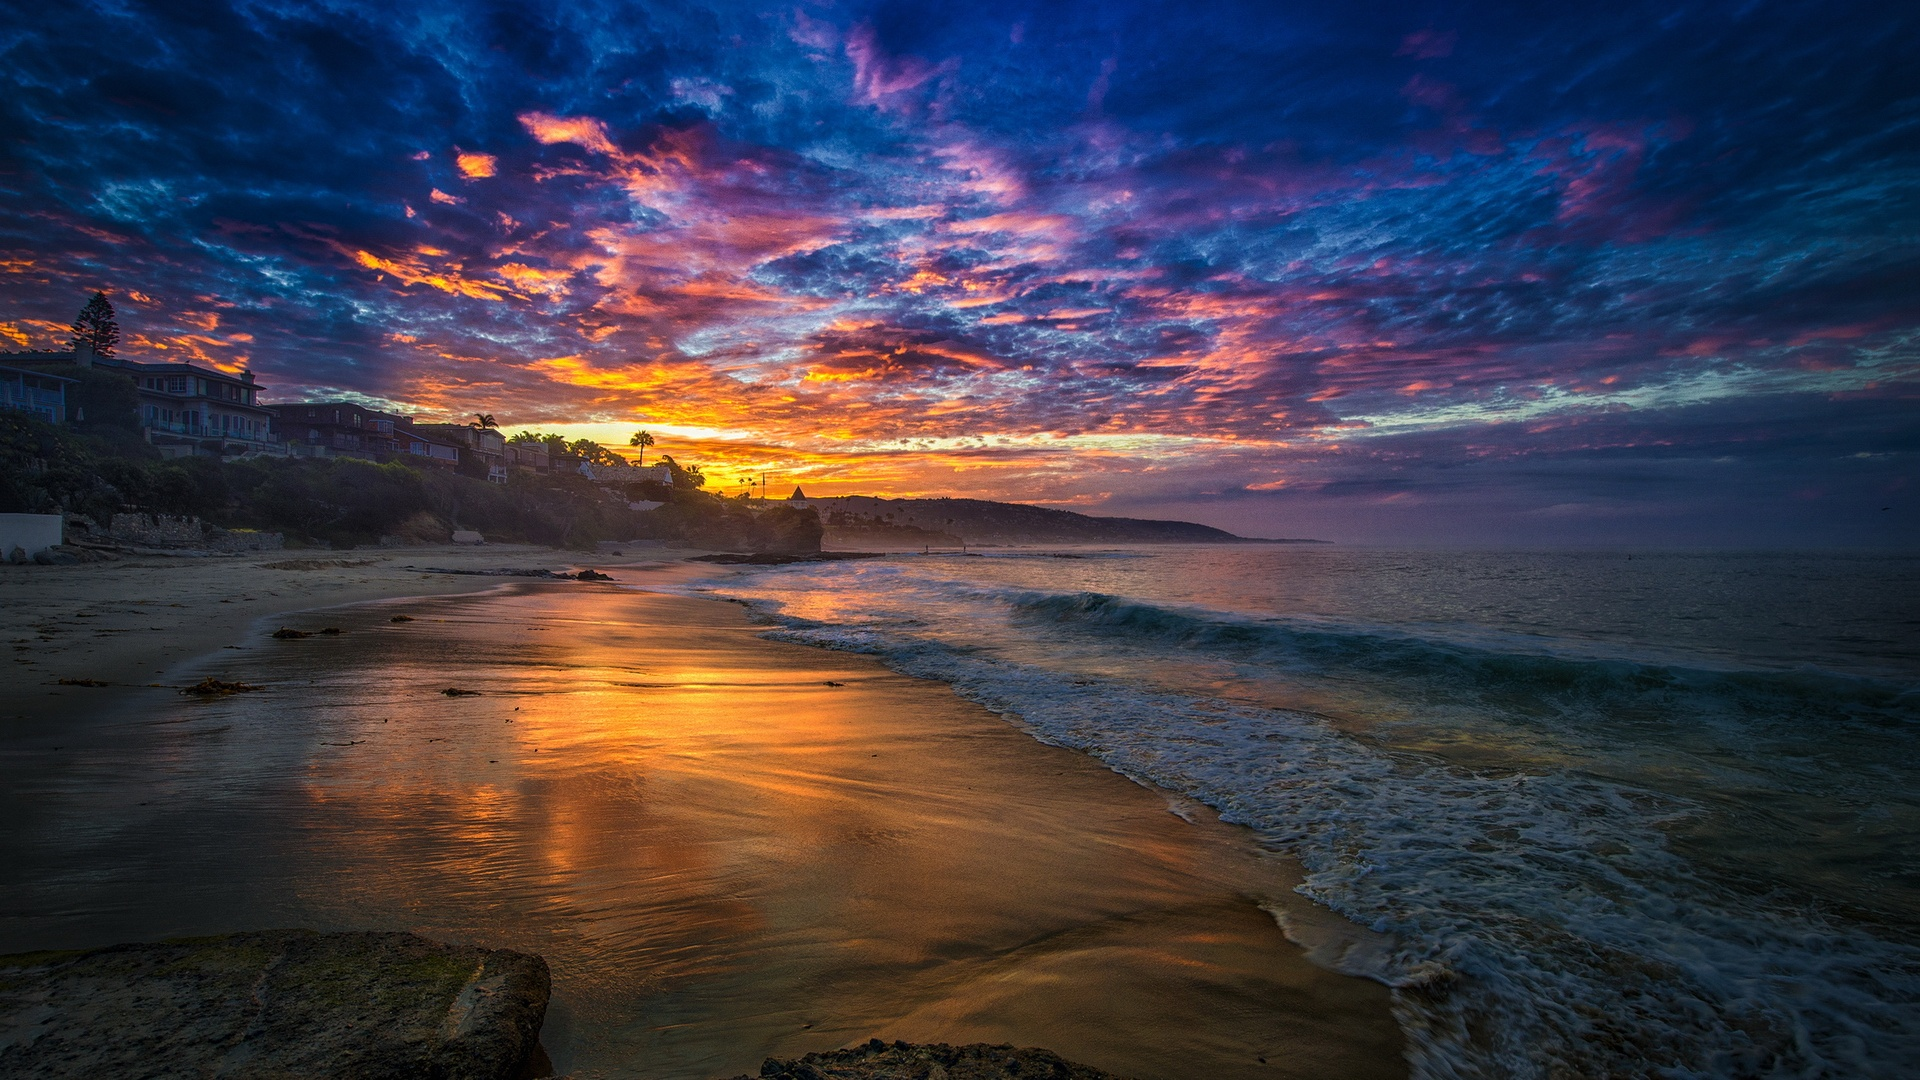 Sunset desktop wallpaper free download